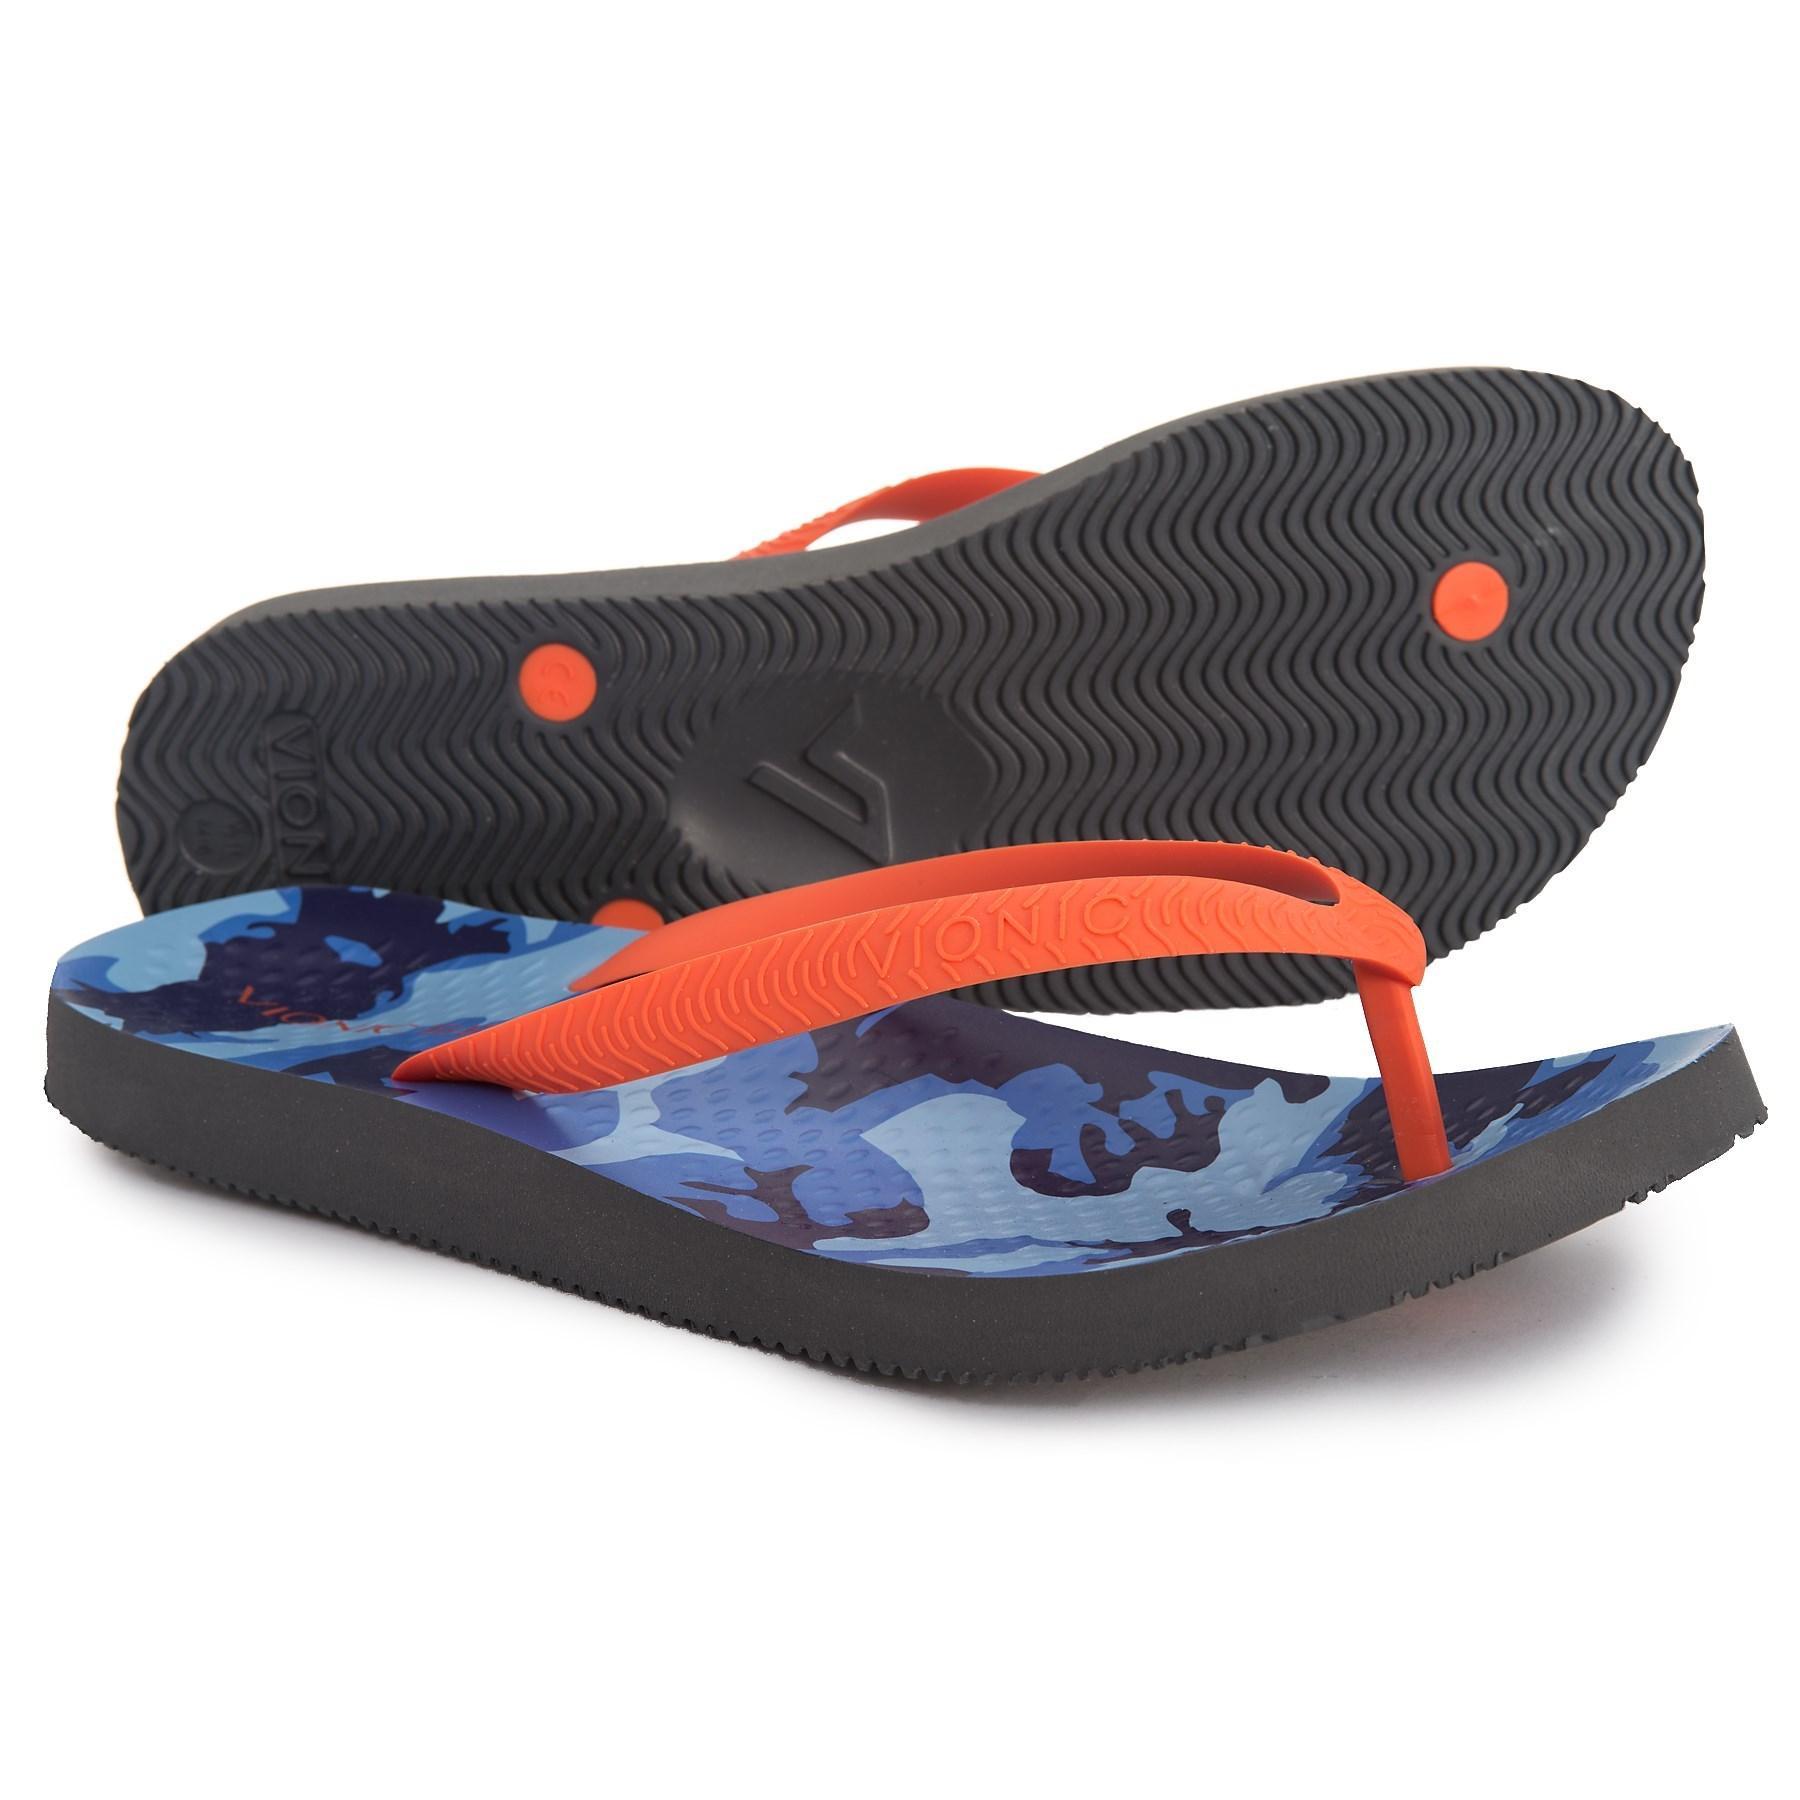 7fa6b05b48a14a Lyst - Vionic Manly Flip-flops (for Men) in Blue for Men